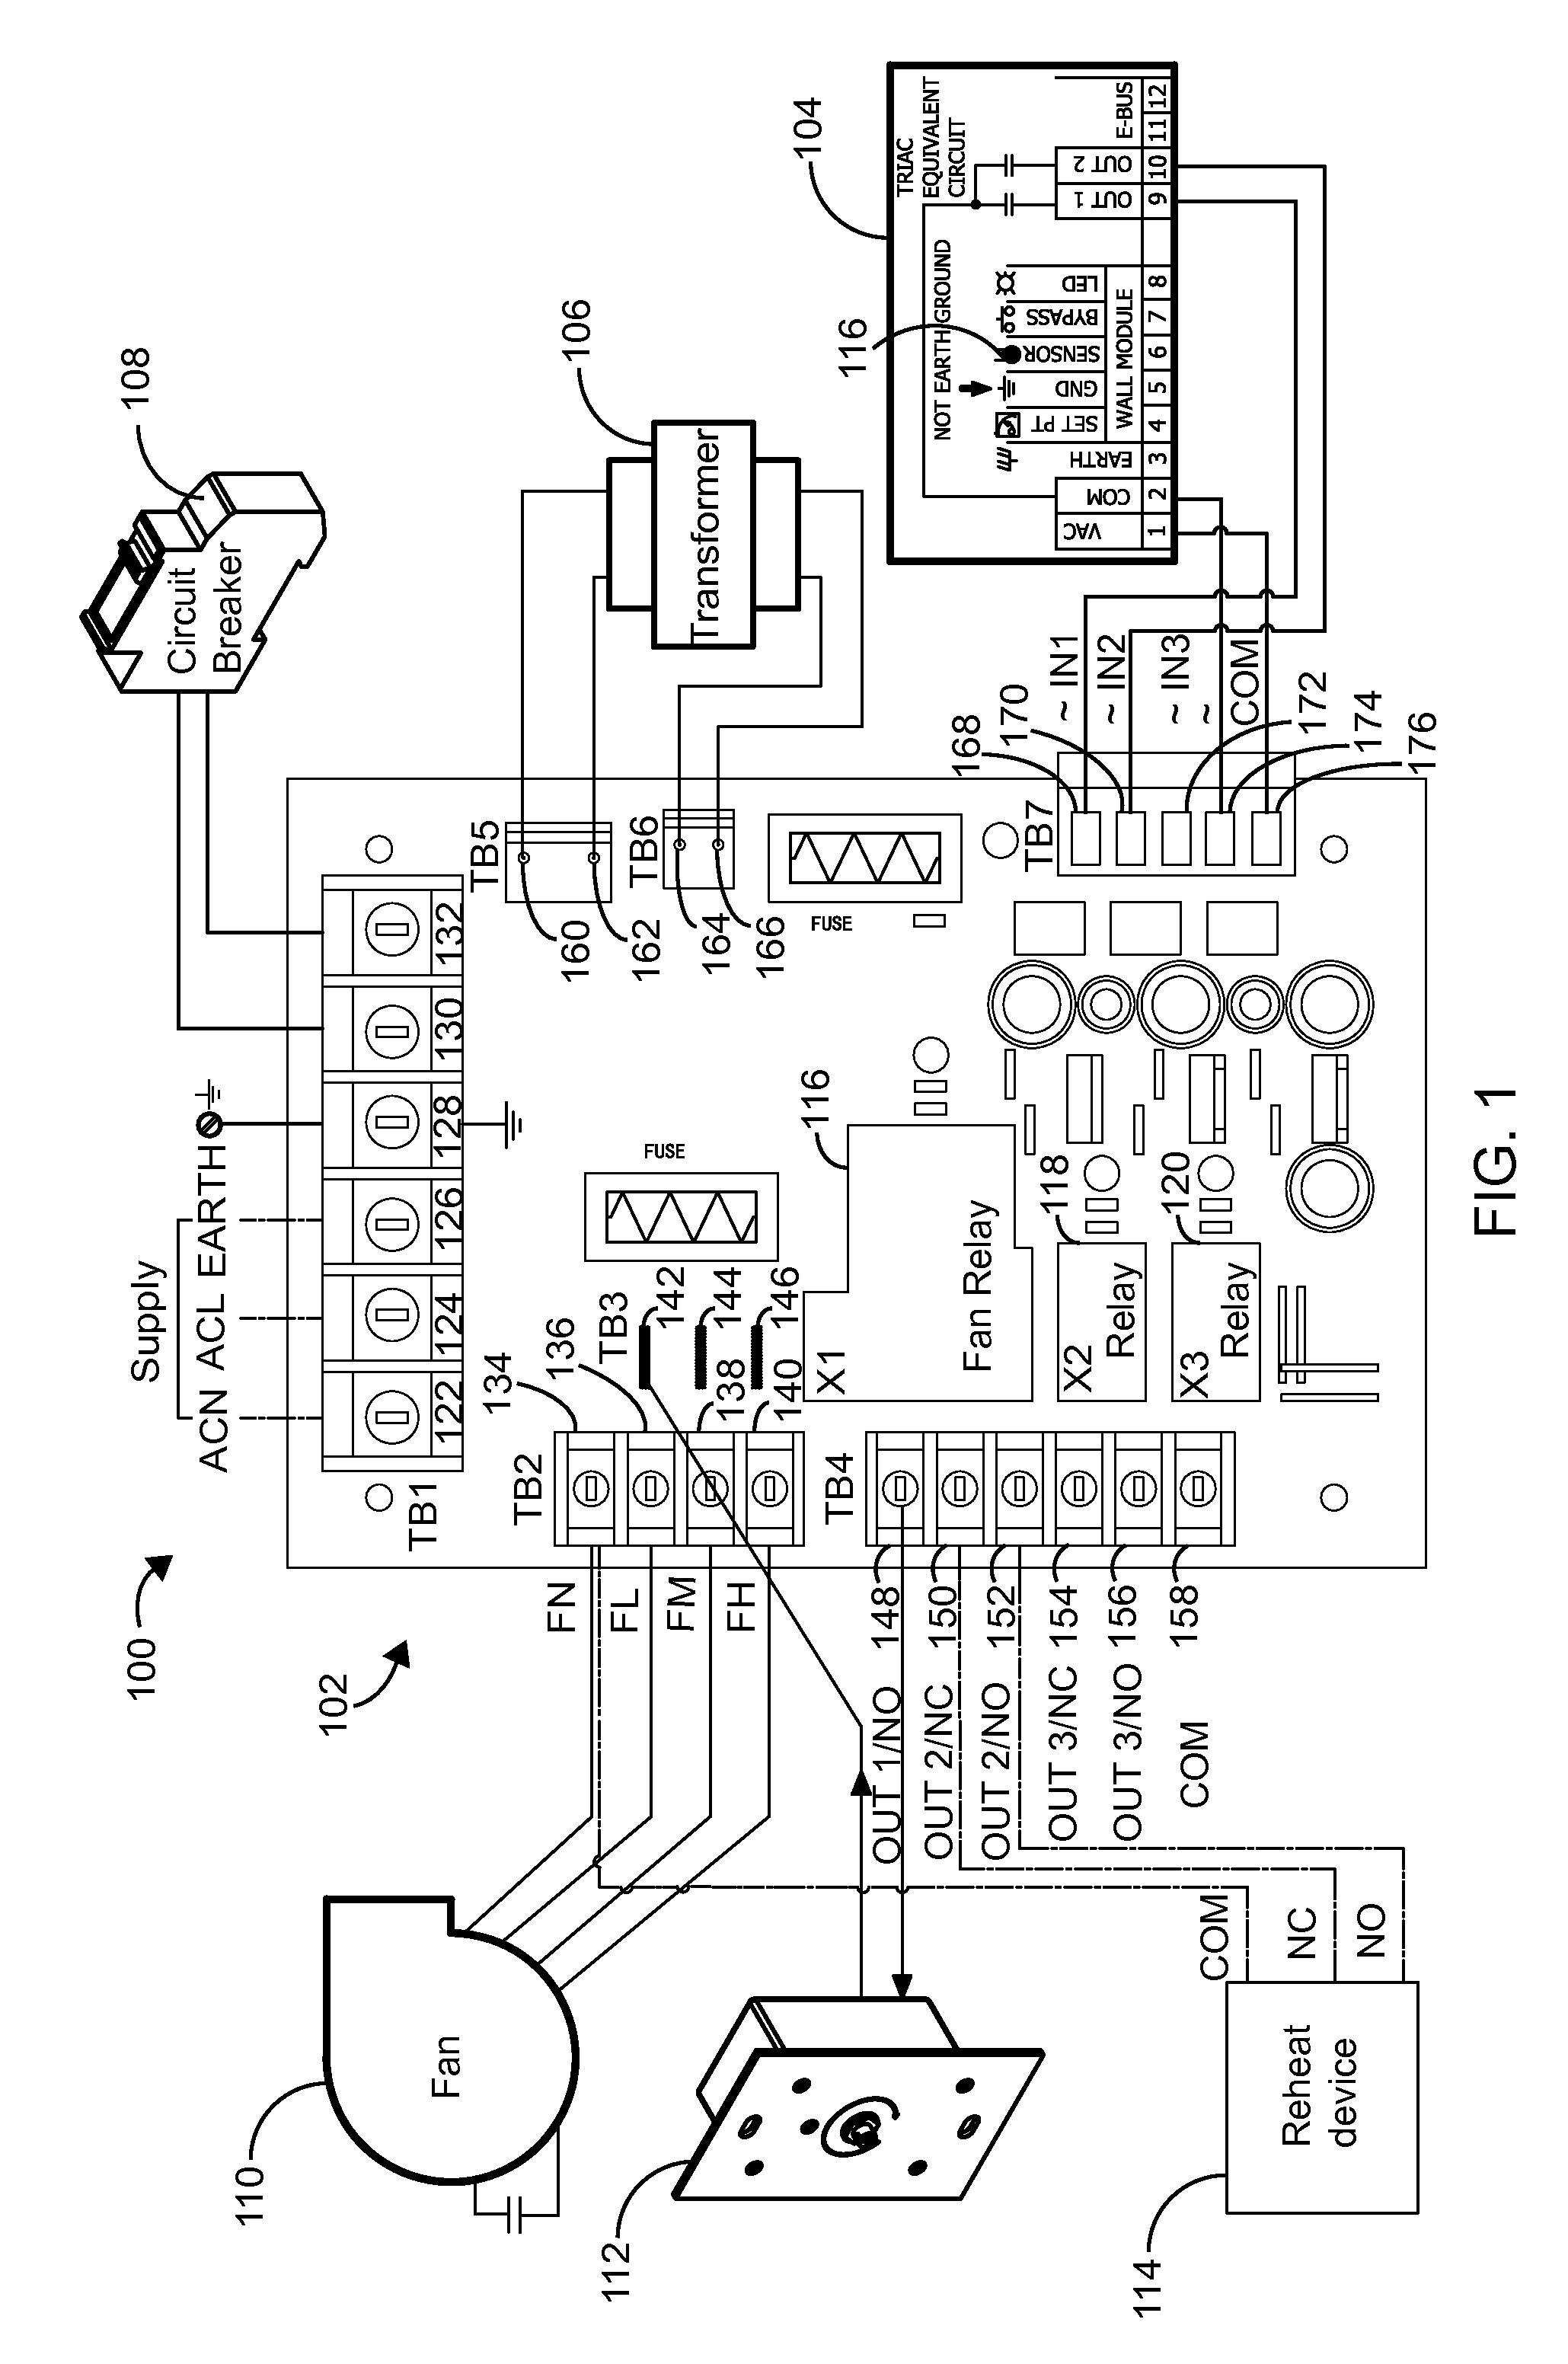 vav control wiring diagram 2000 international 4700 wiring